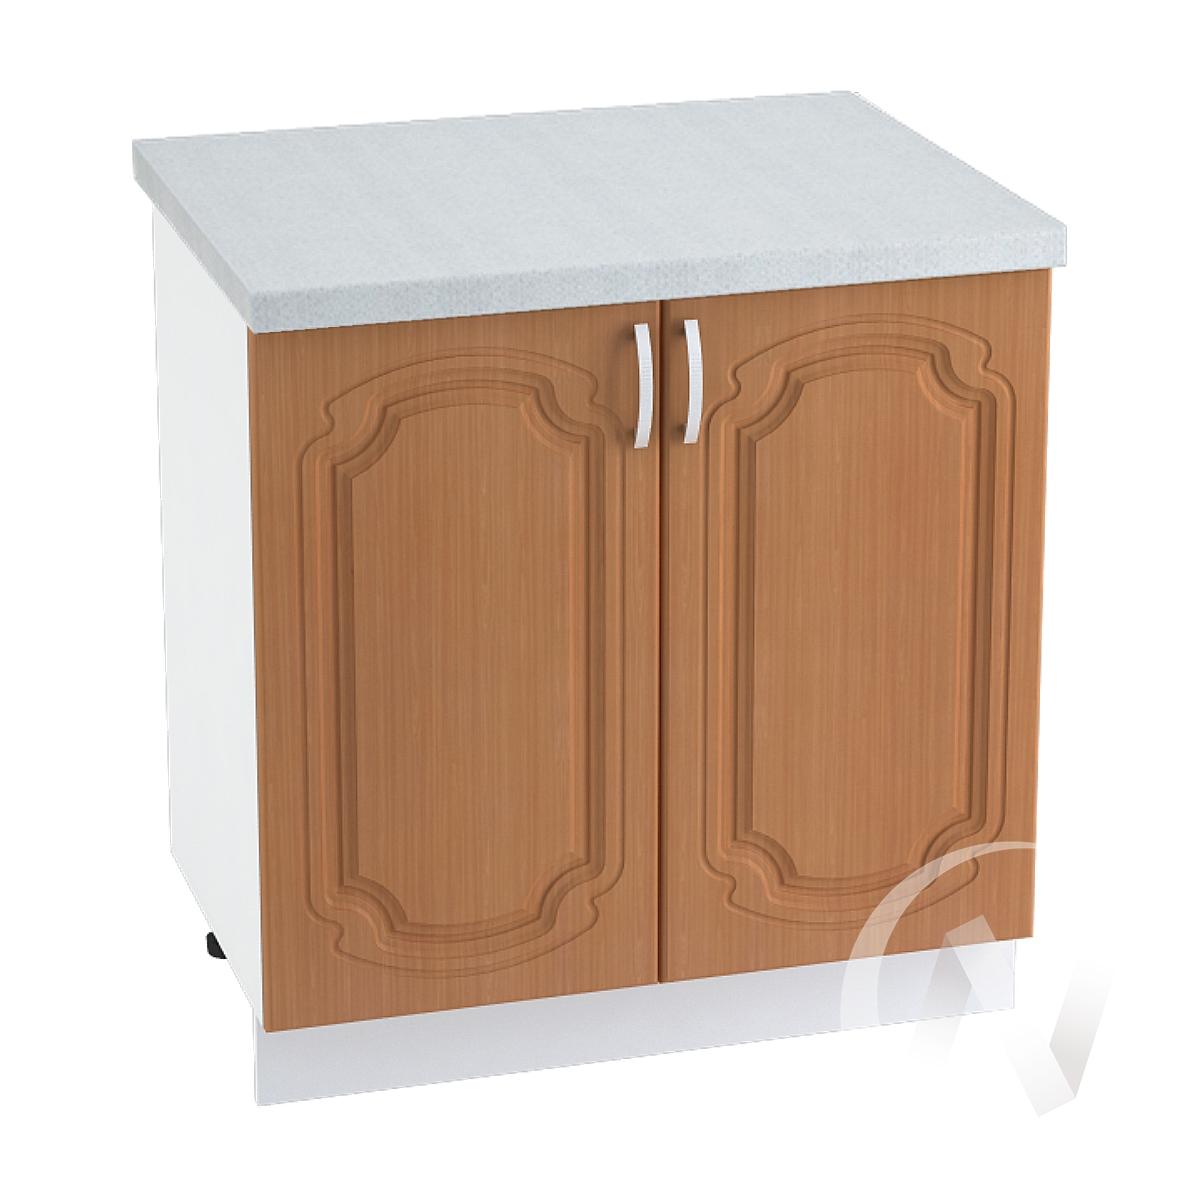 "Кухня ""Настя"": Шкаф нижний 800, ШН 800 (Орех миланский/корпус белый)"